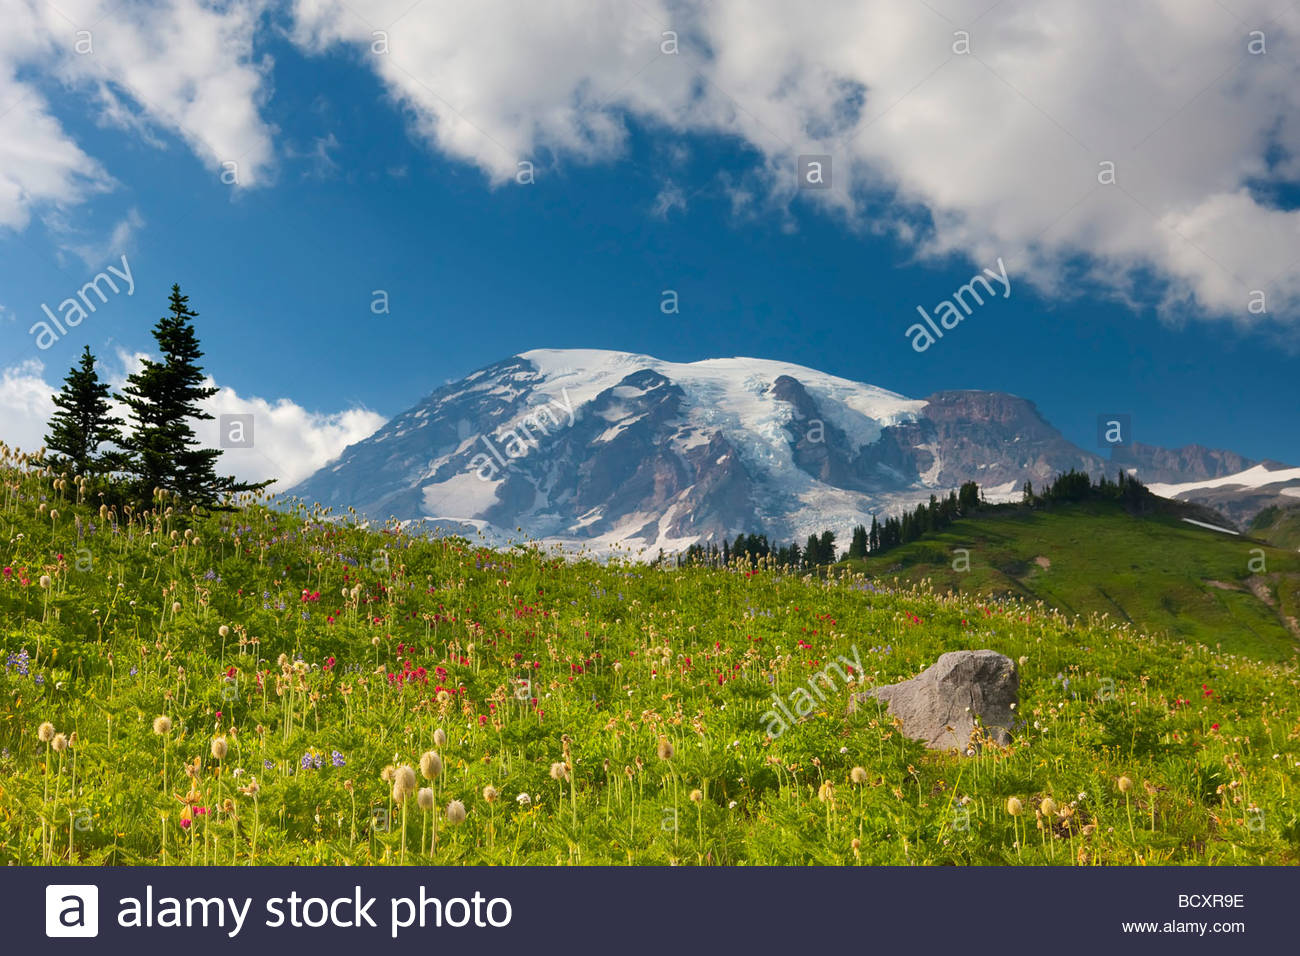 Summer wildflowers blanket the alpine meadows of Paradise in Mount Rainier National Park, Washington. - Stock Image